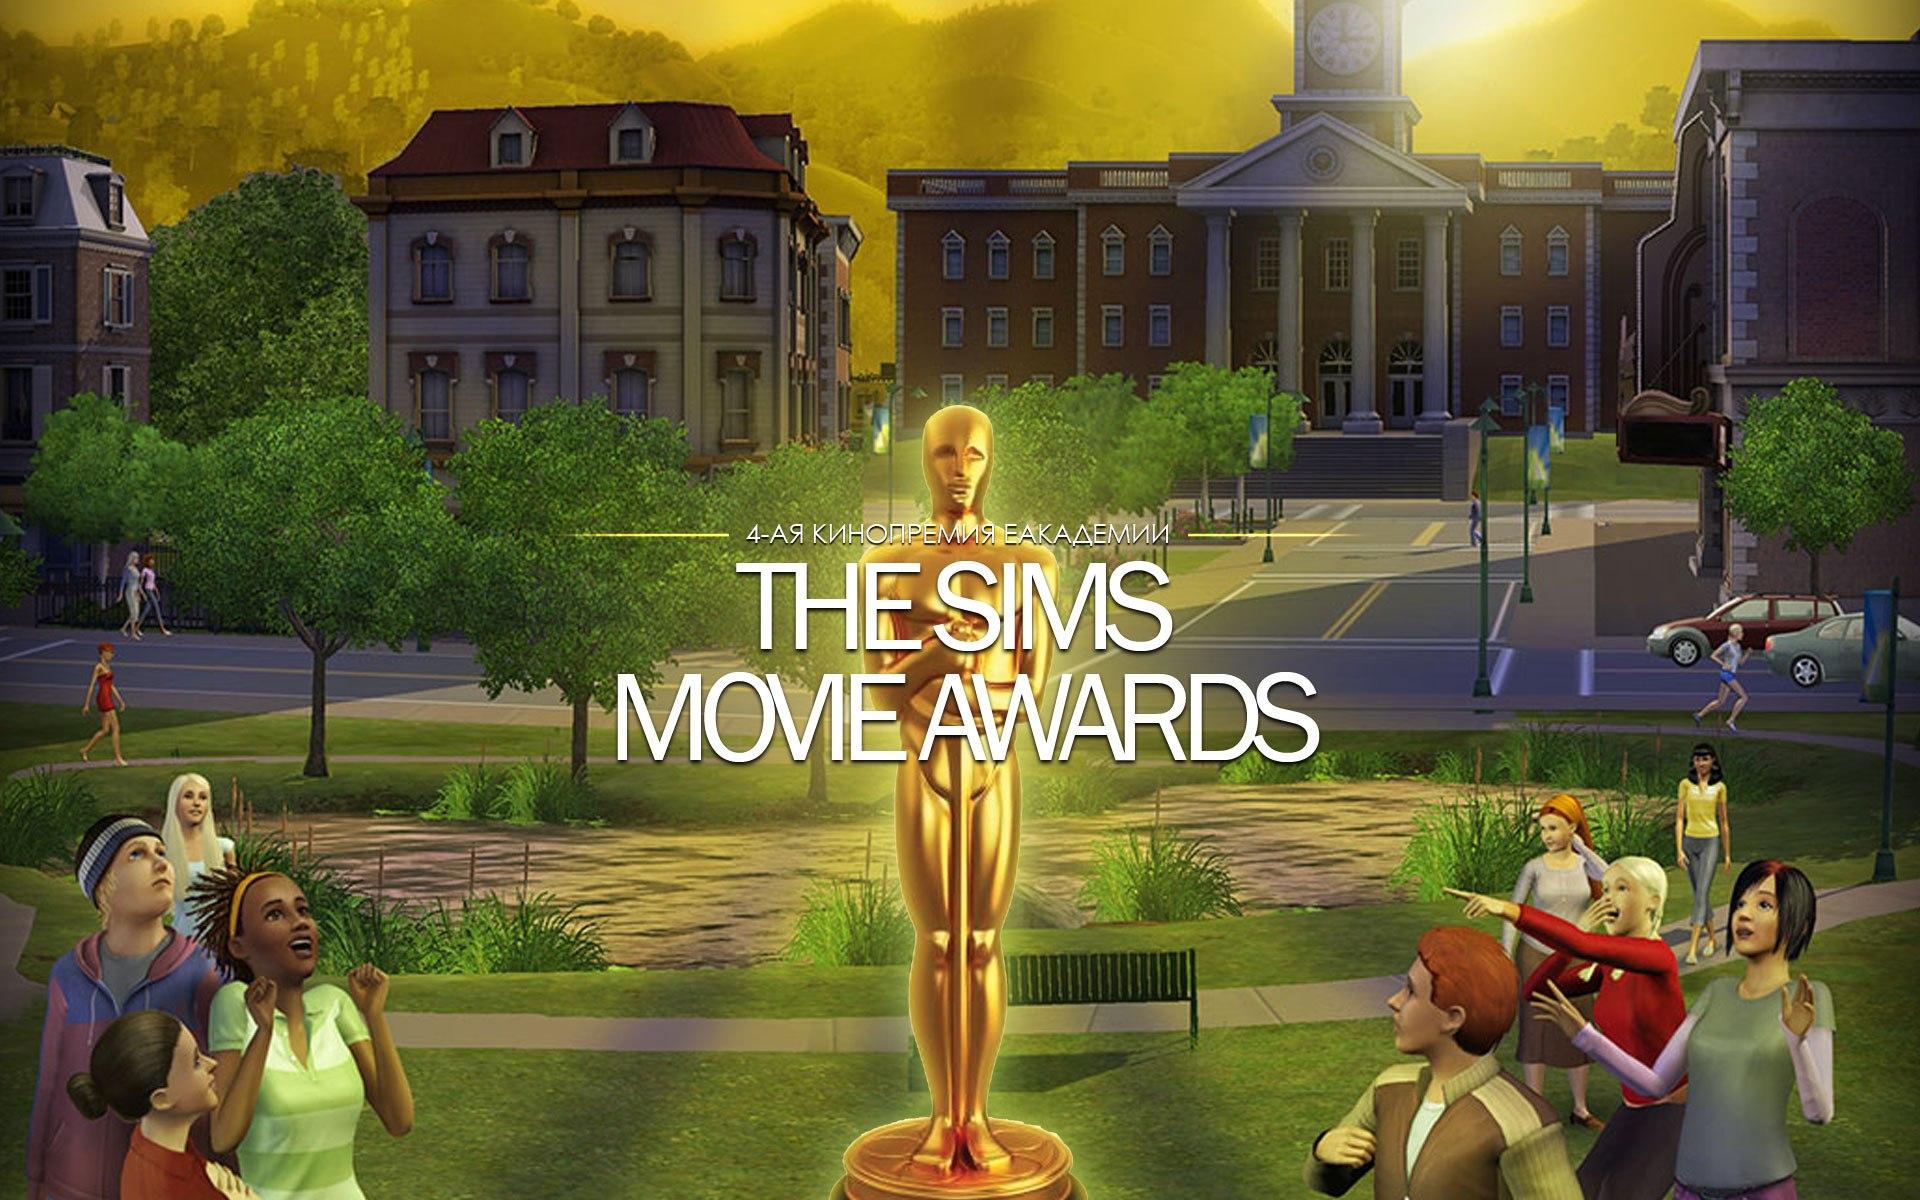 Vínci/EAкадемия The Sims объявляет о старте конкурса The Sims Movie Awards